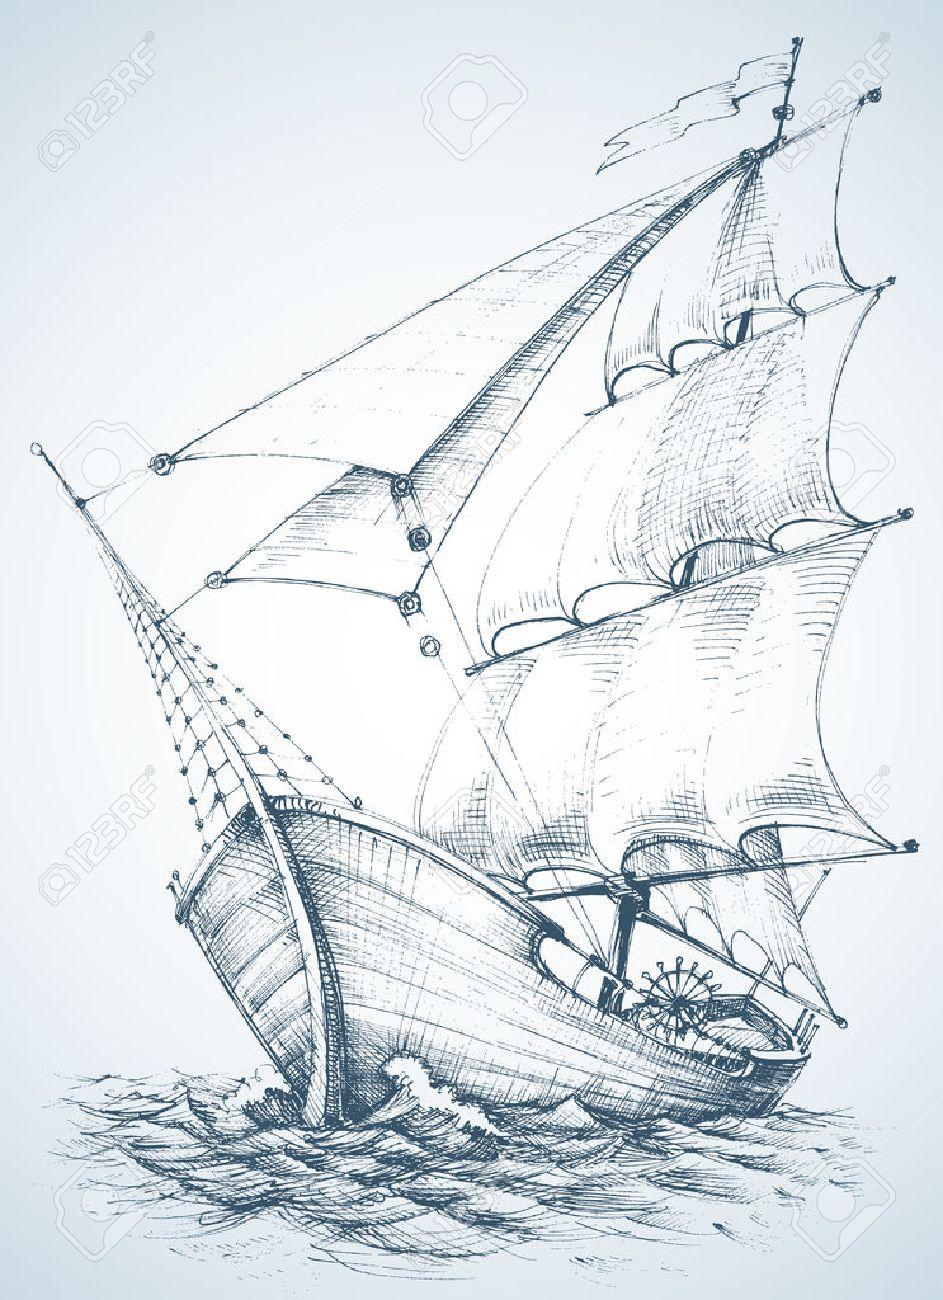 Sailboat wallpaper Stock Vector - 40928555